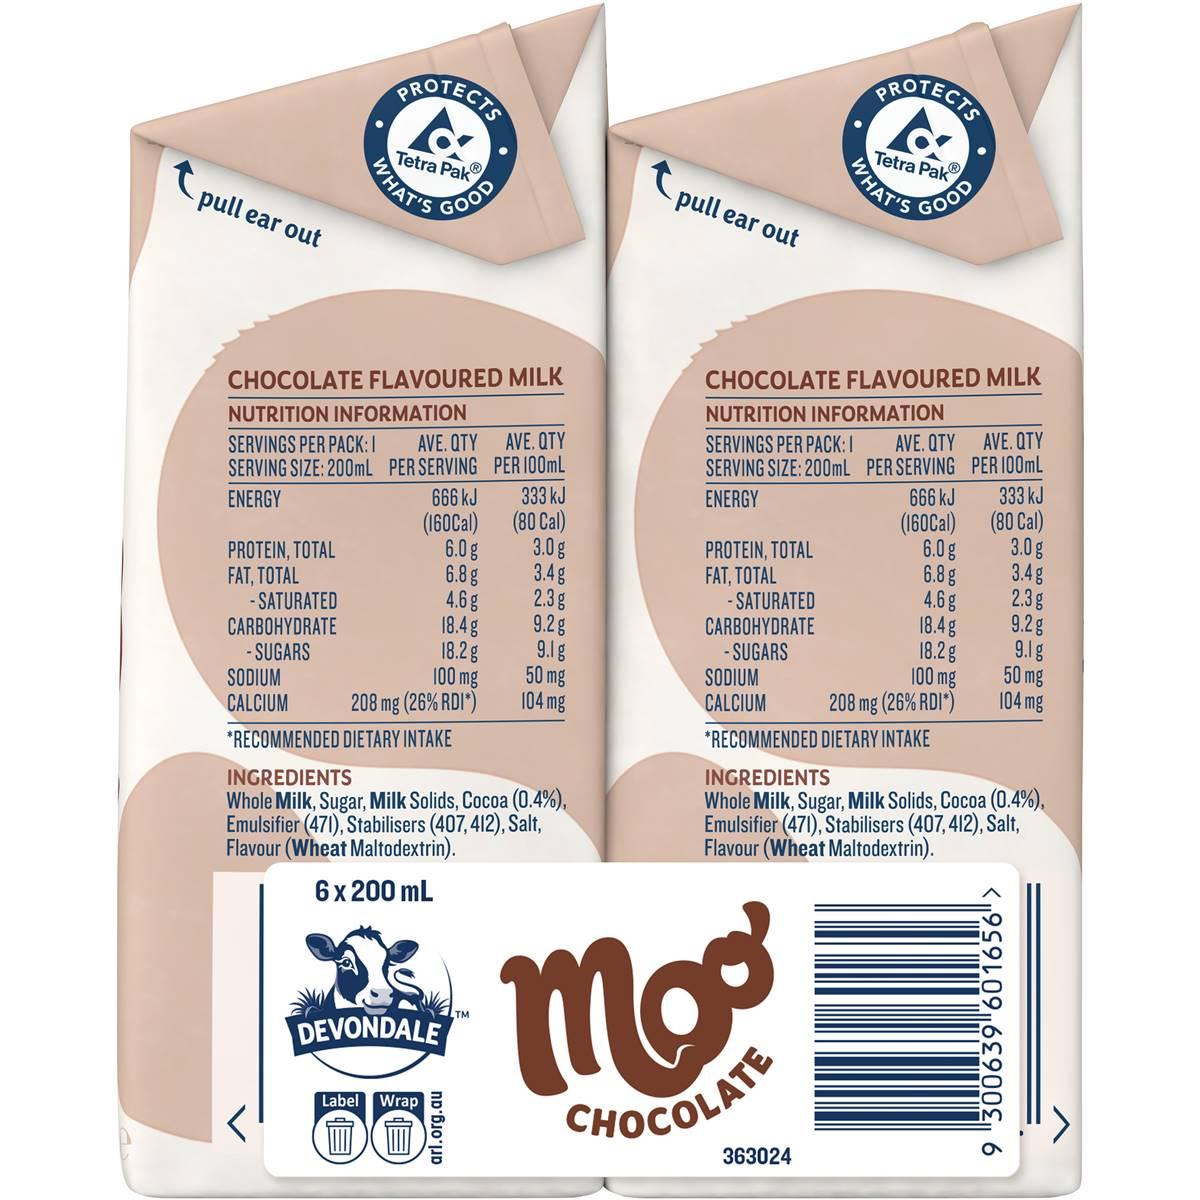 Devondale Chocolate Milk Nutrition